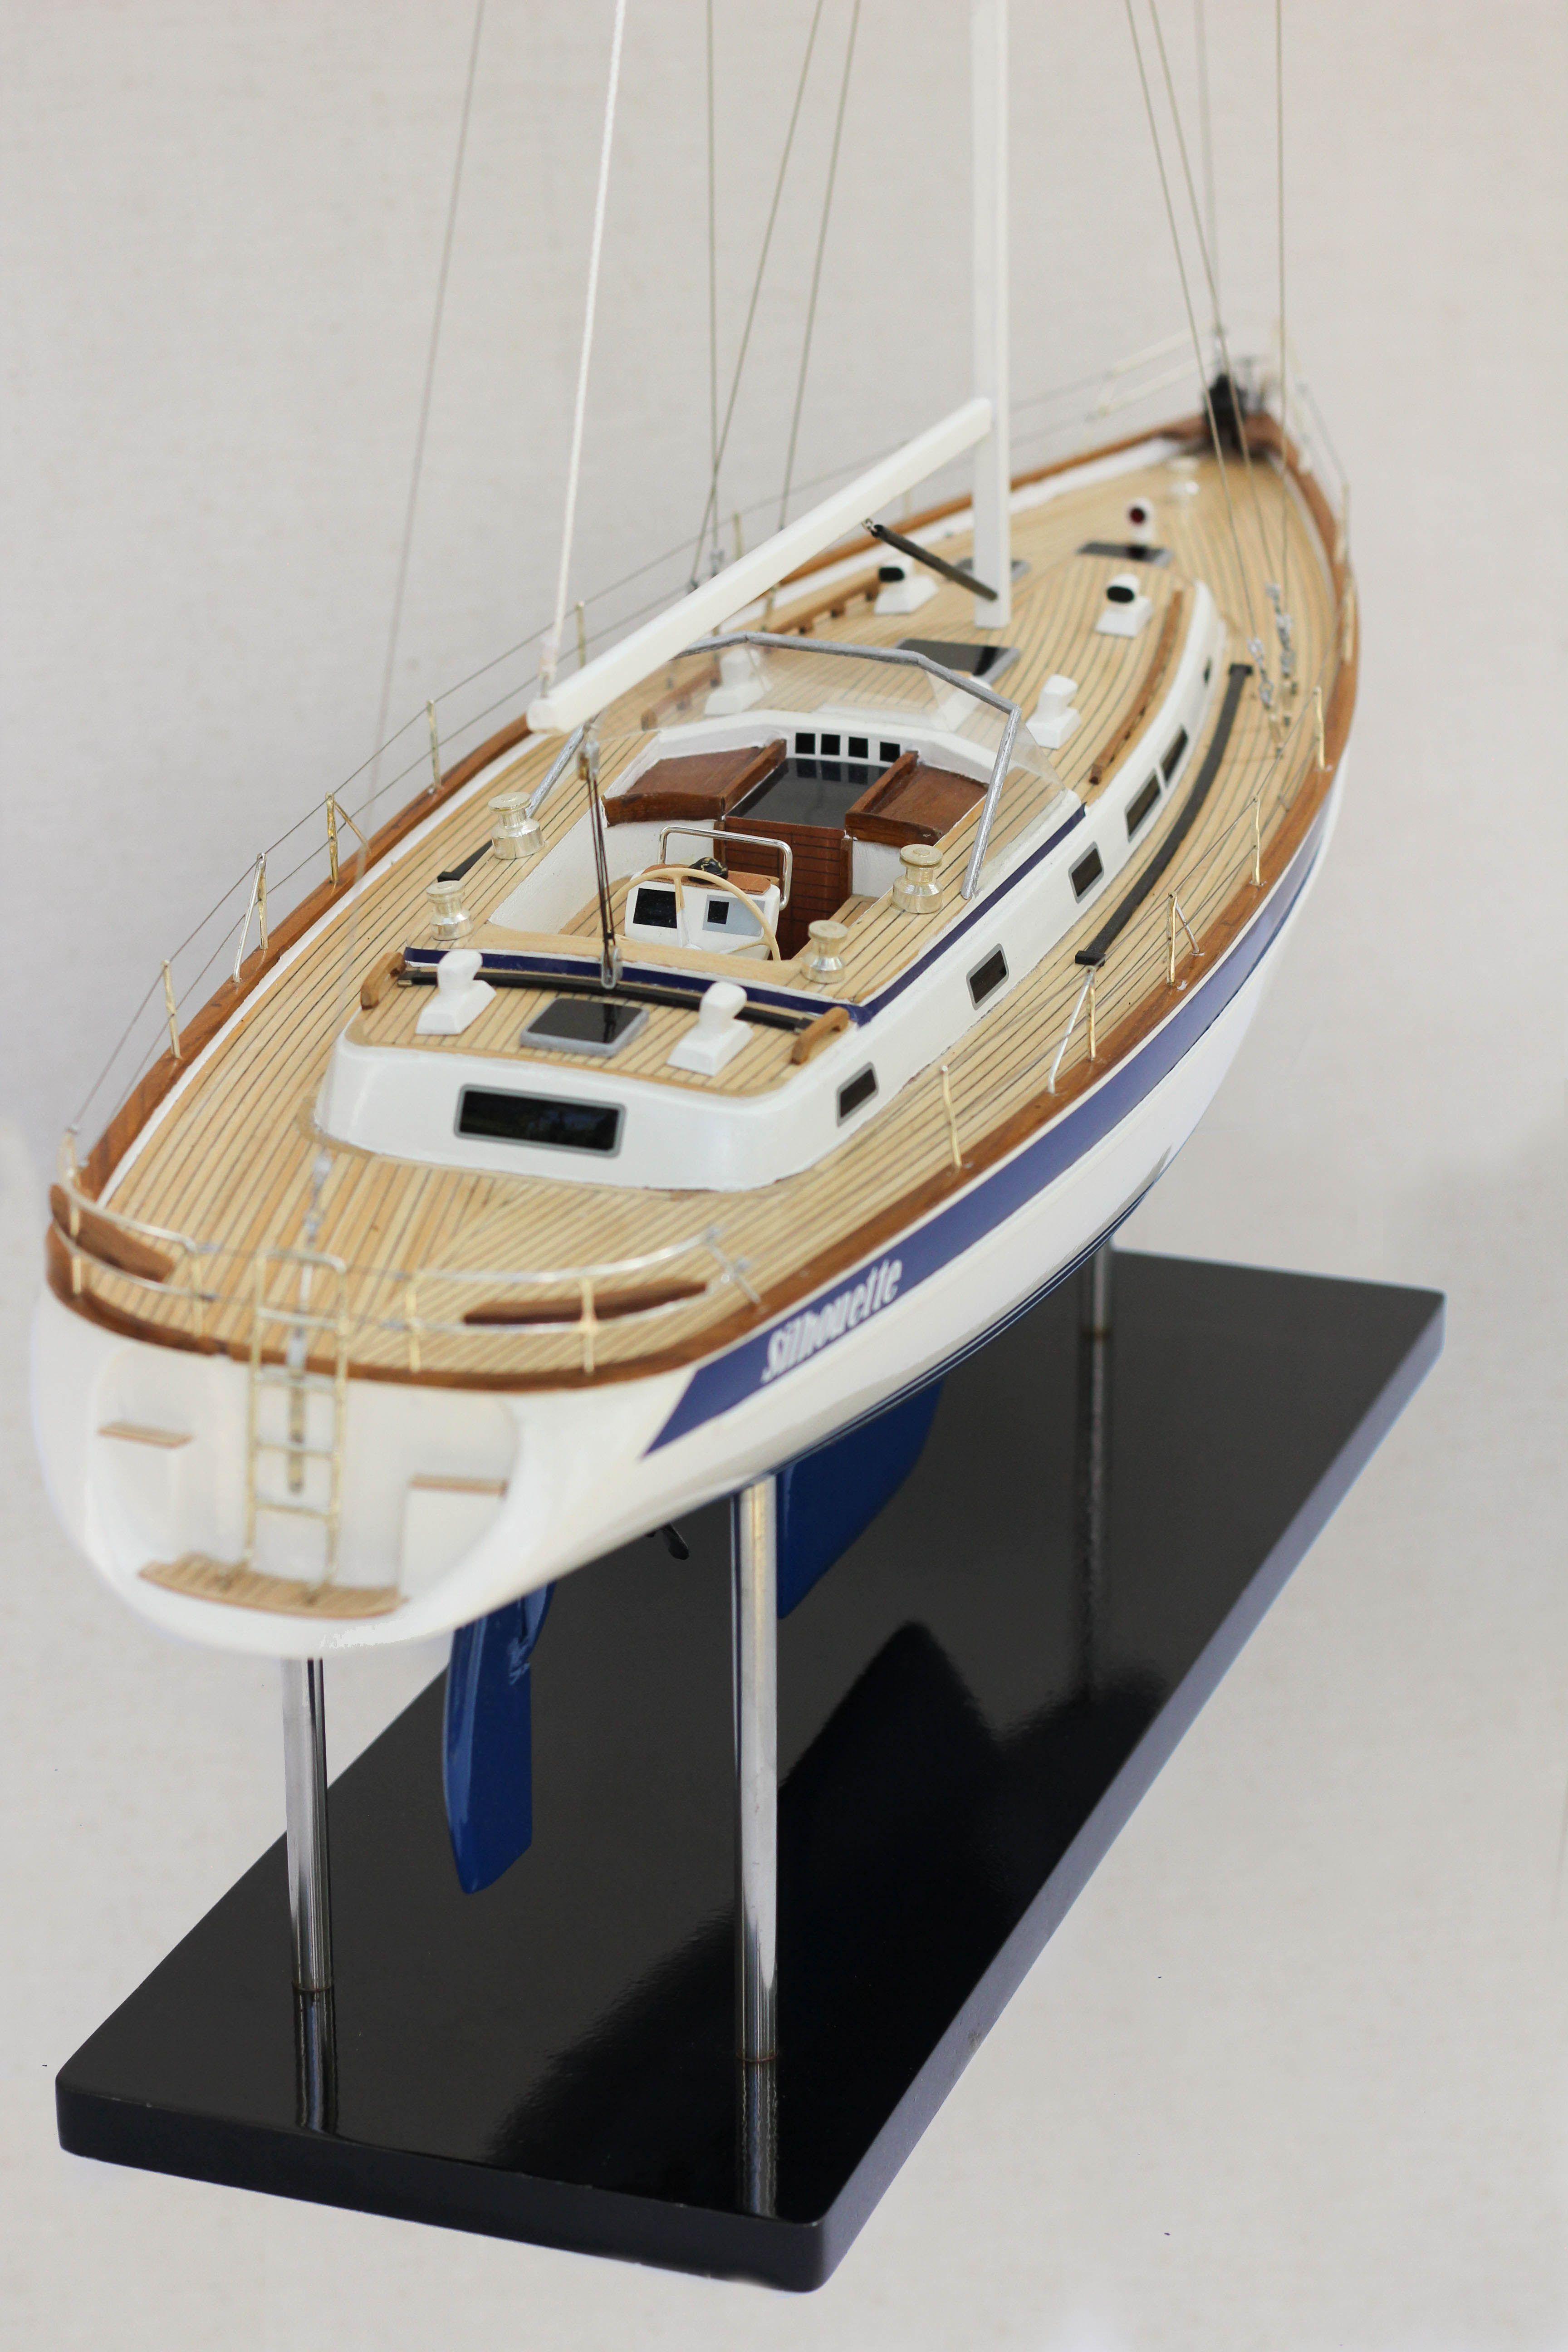 2541-14443-Halberg-Rassy-42-Model-Sailing-Boat-Superior-Range